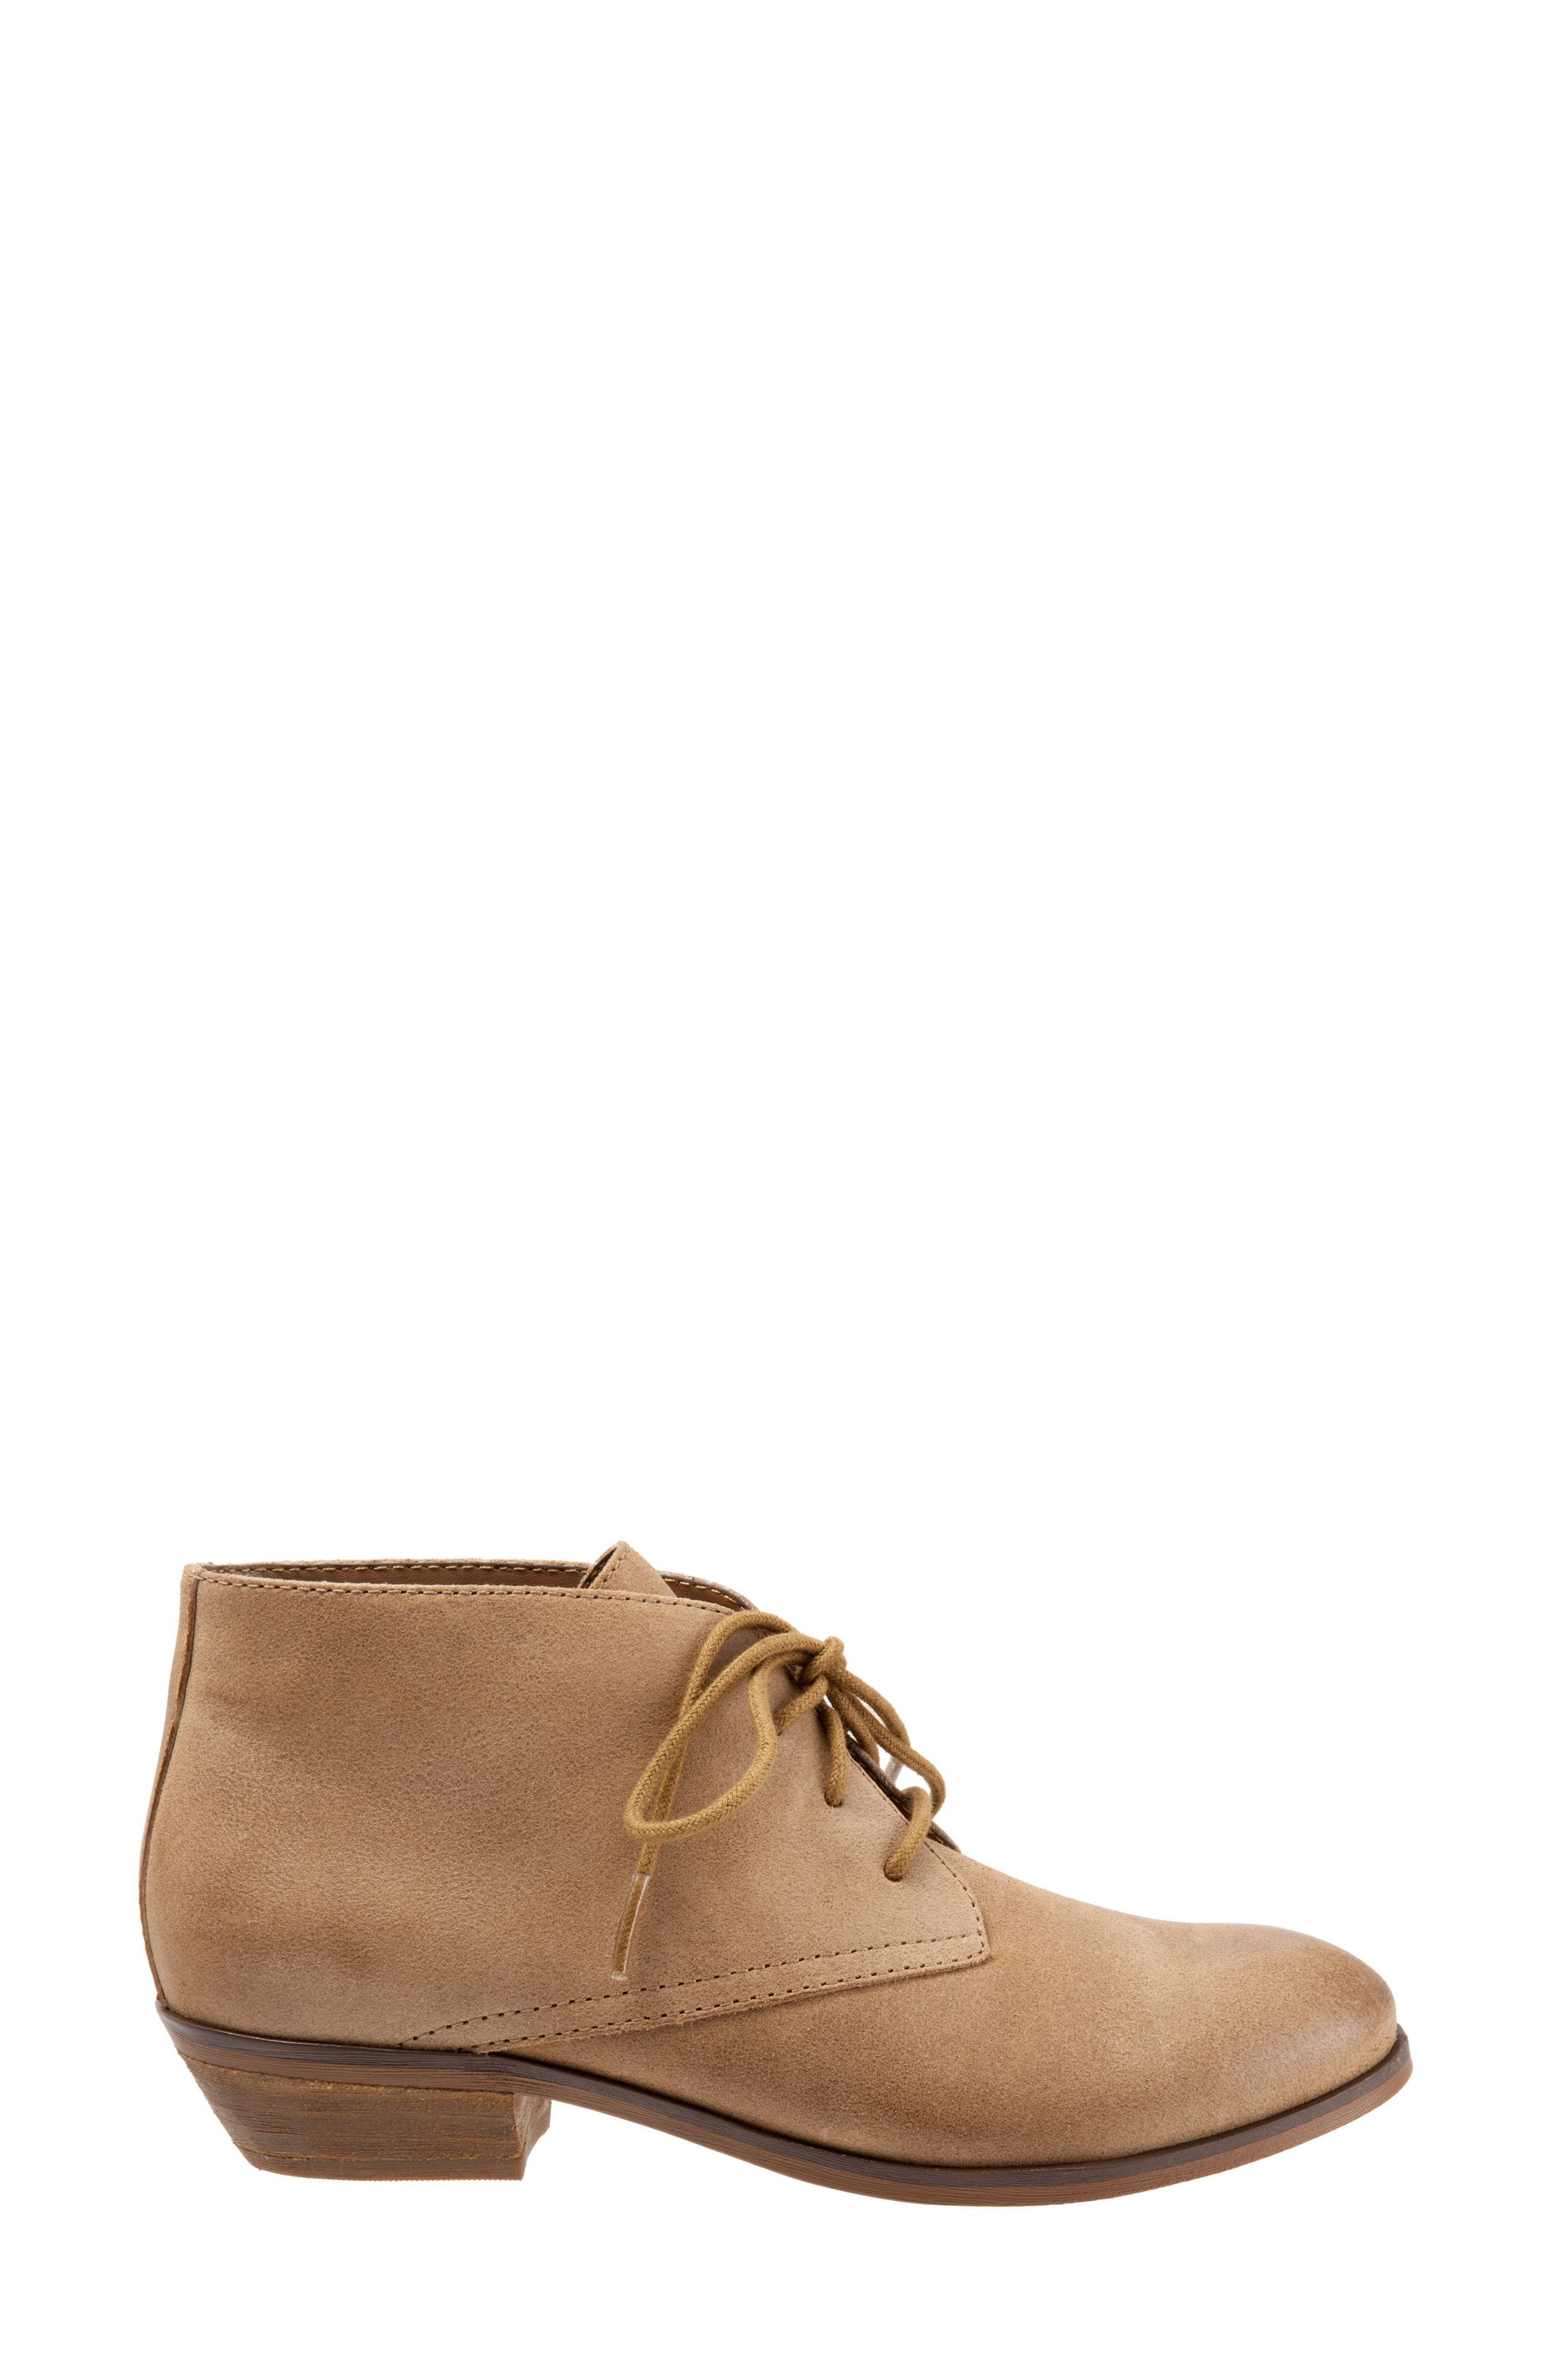 'Ramsey' Chukka Boot,                             Alternate thumbnail 3, color,                             Sand Leather